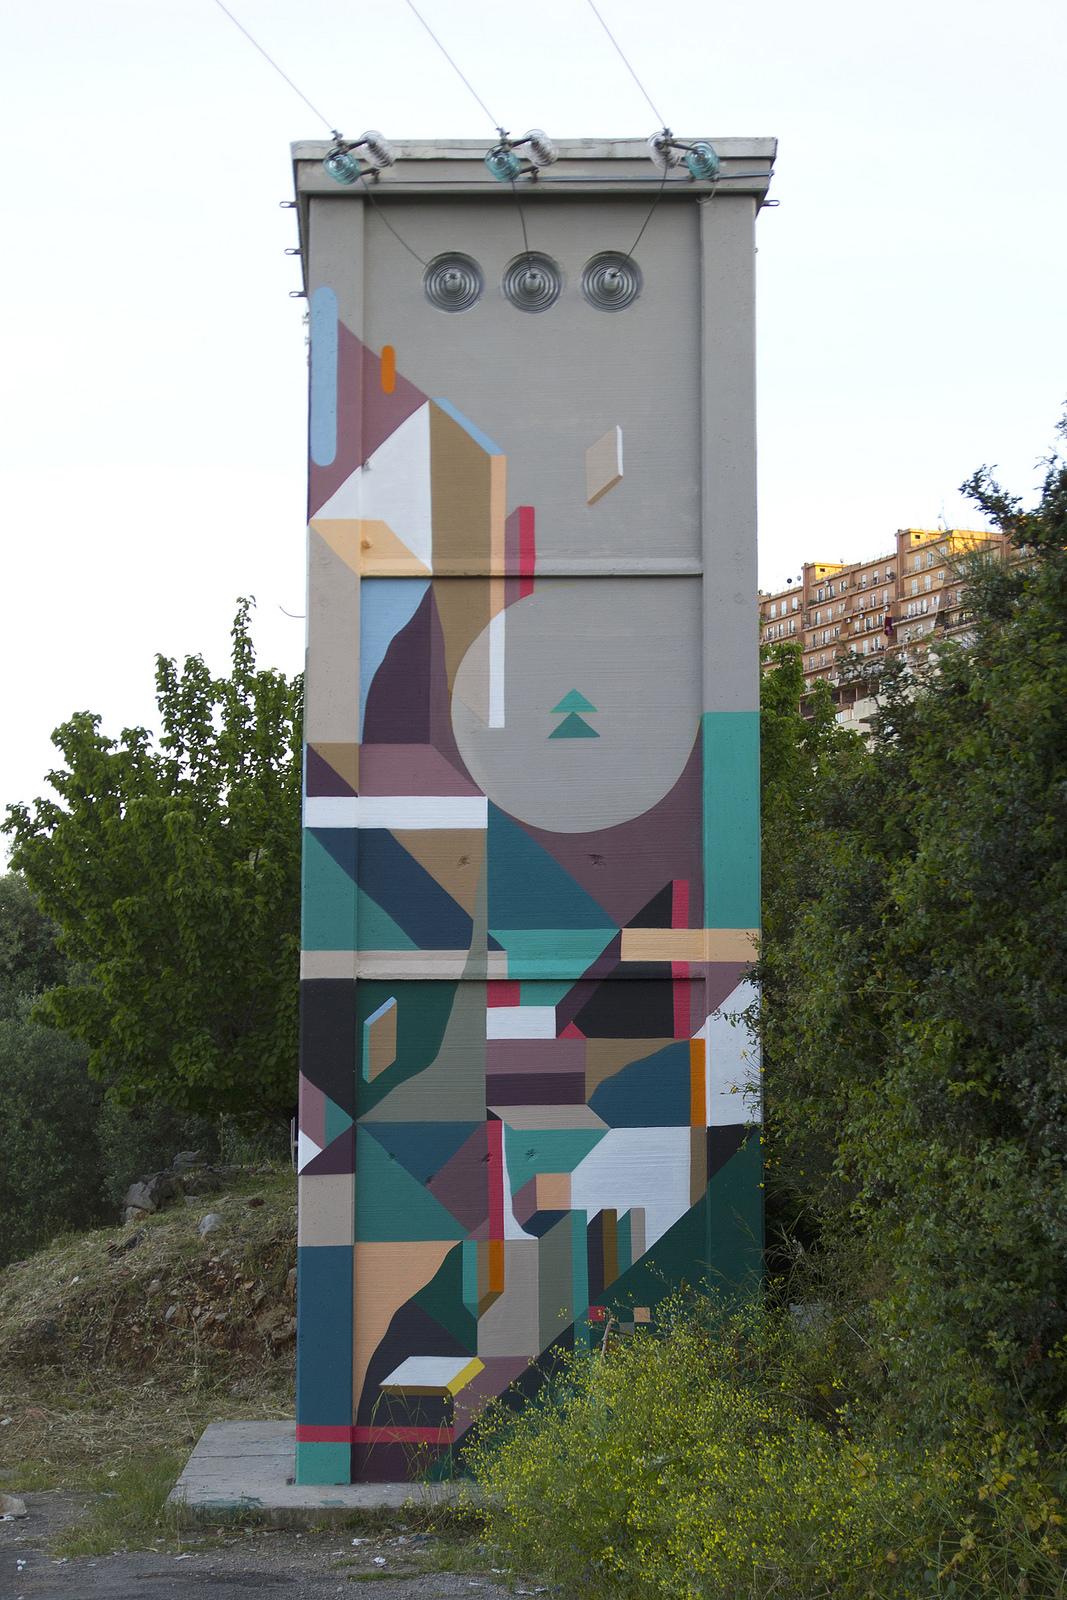 nelio-new-murals-for-memorie-urbane-festival-2014-06